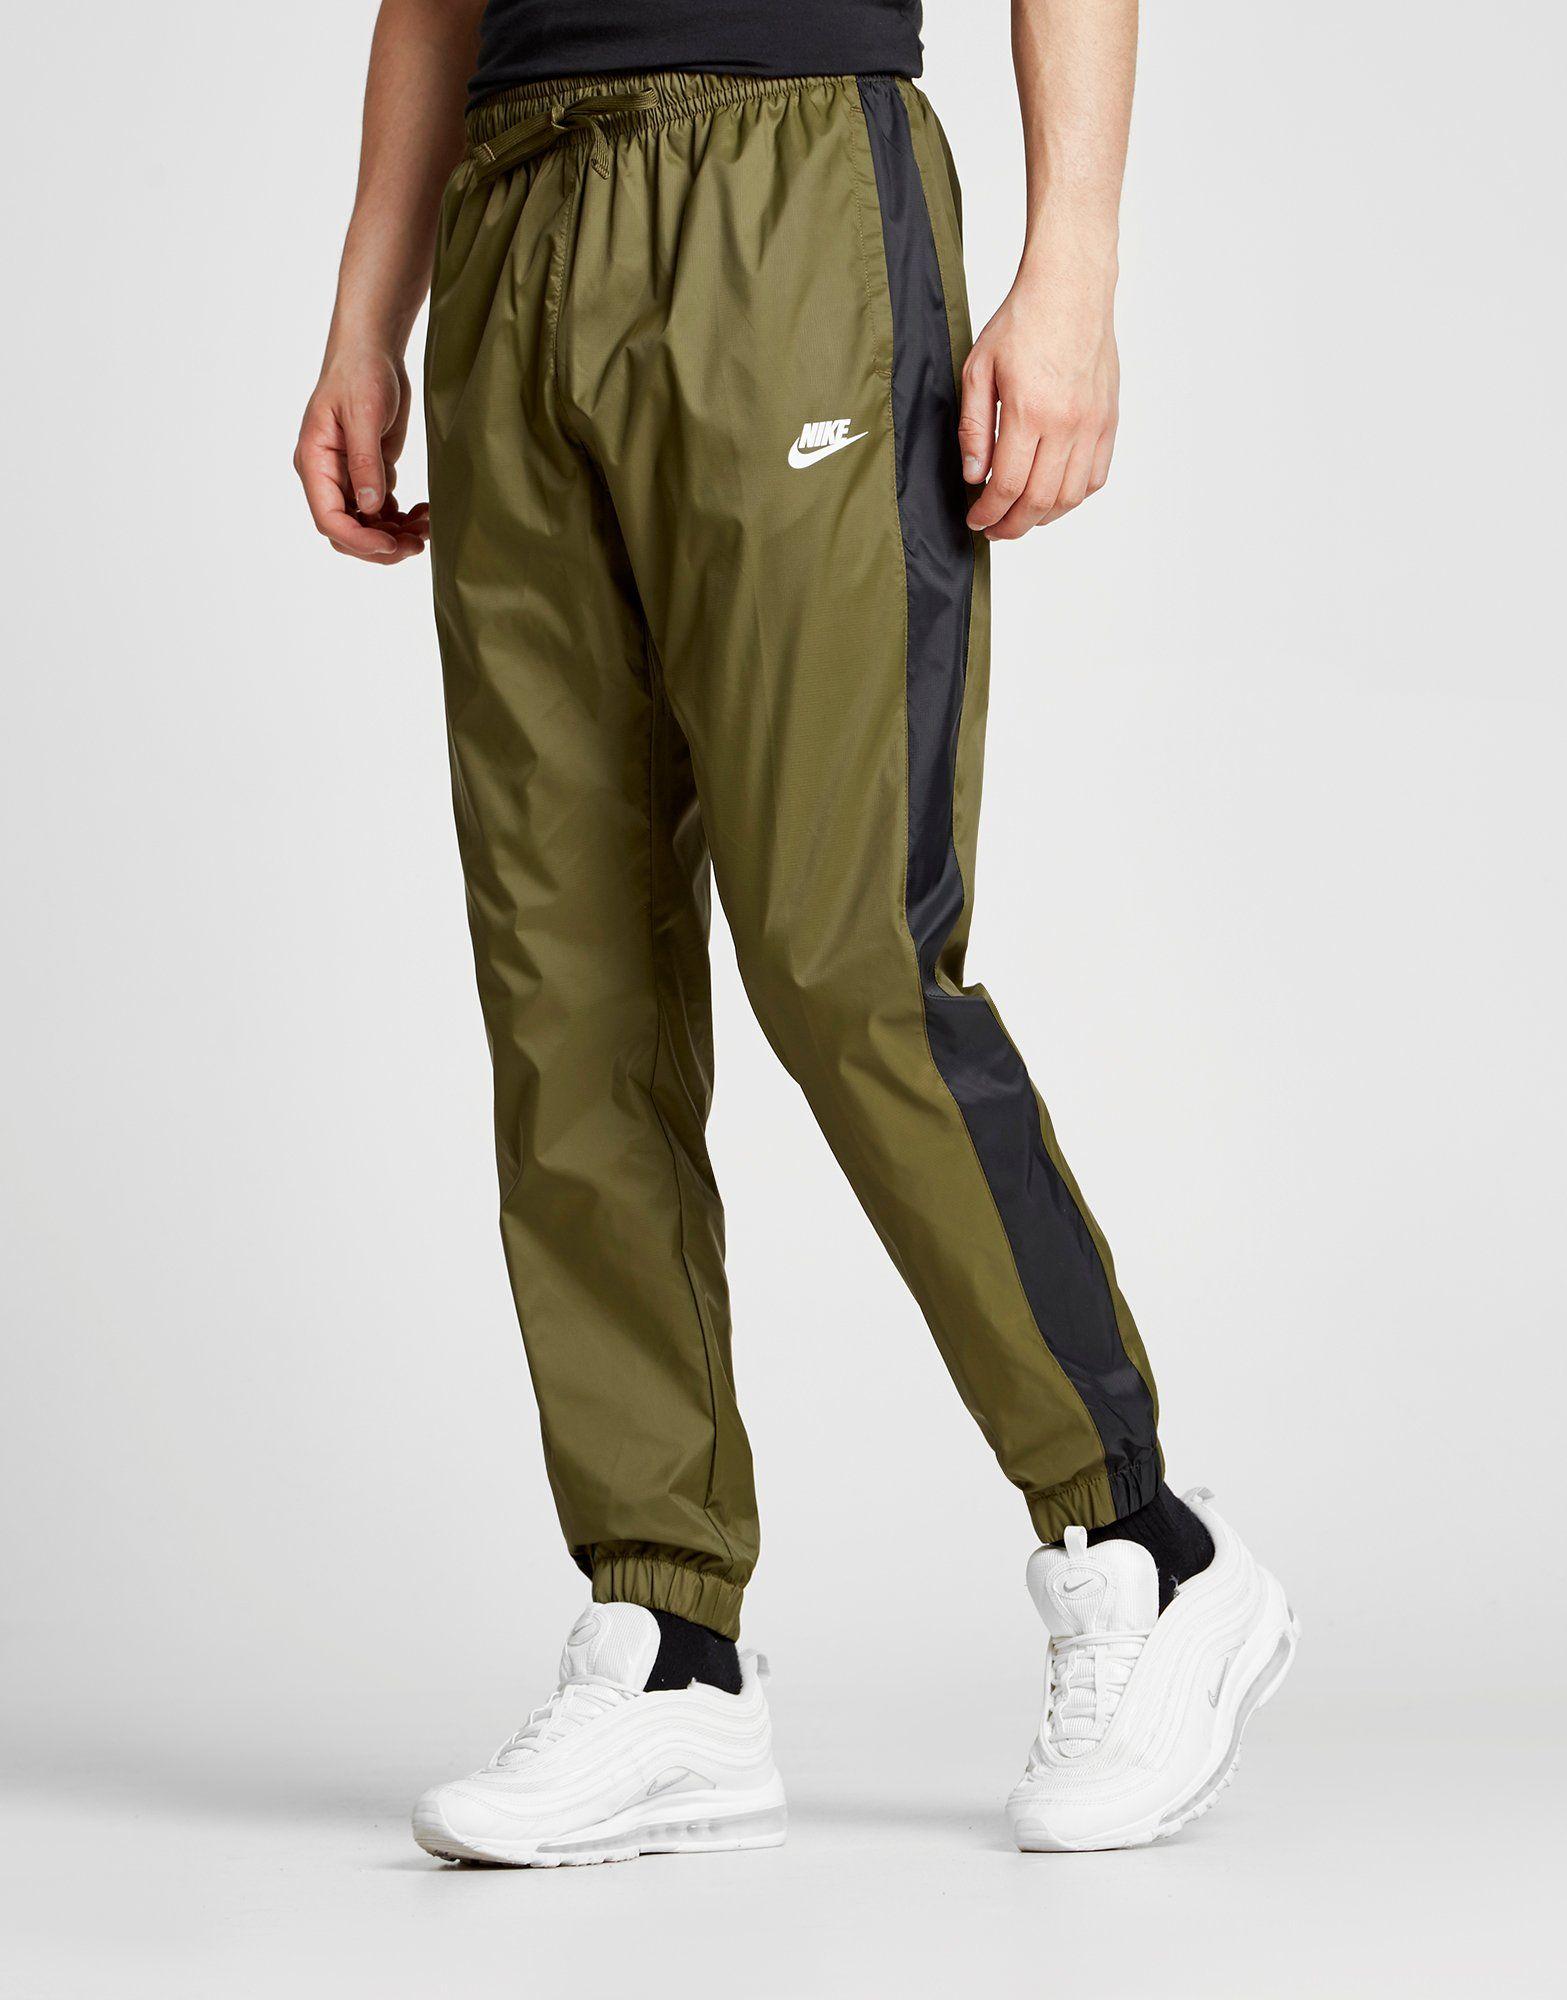 a96b9826a98 Nike Shut Out Track Pants